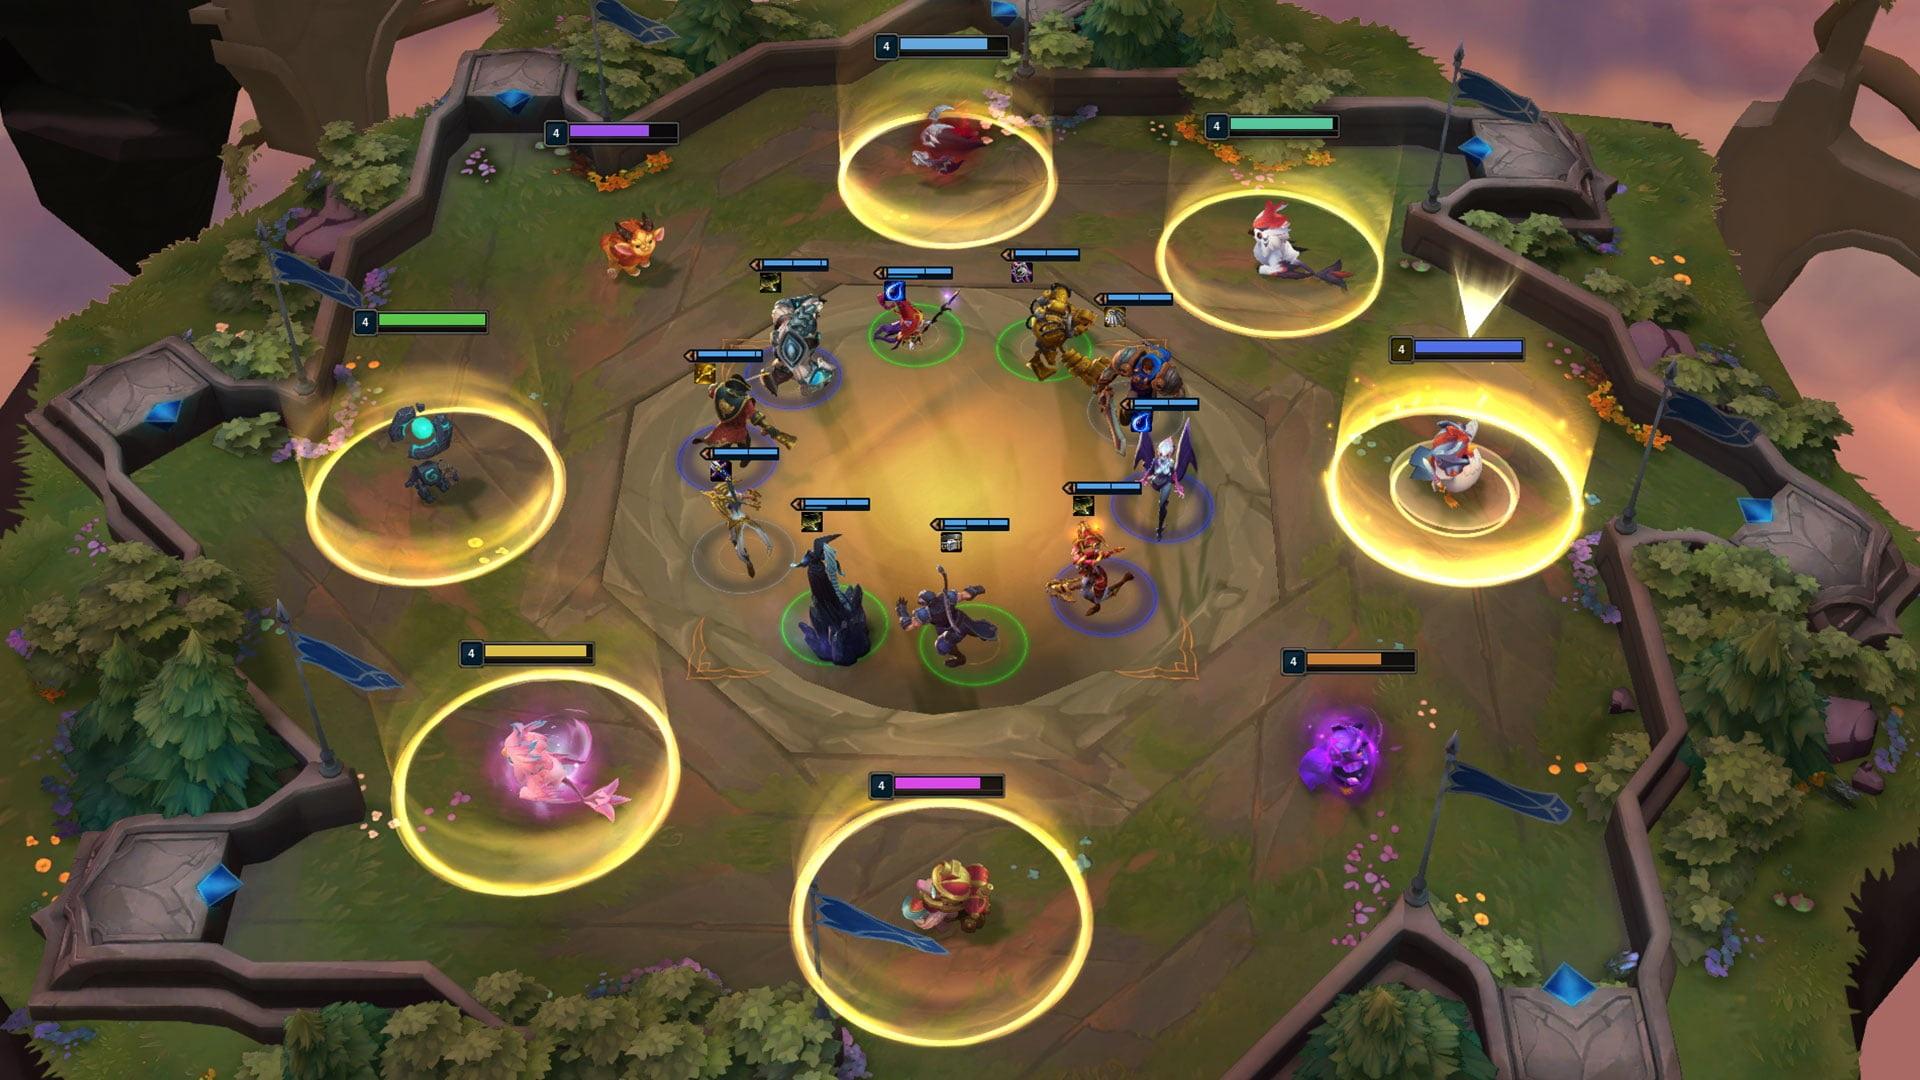 Teamfight Tactics shared draft